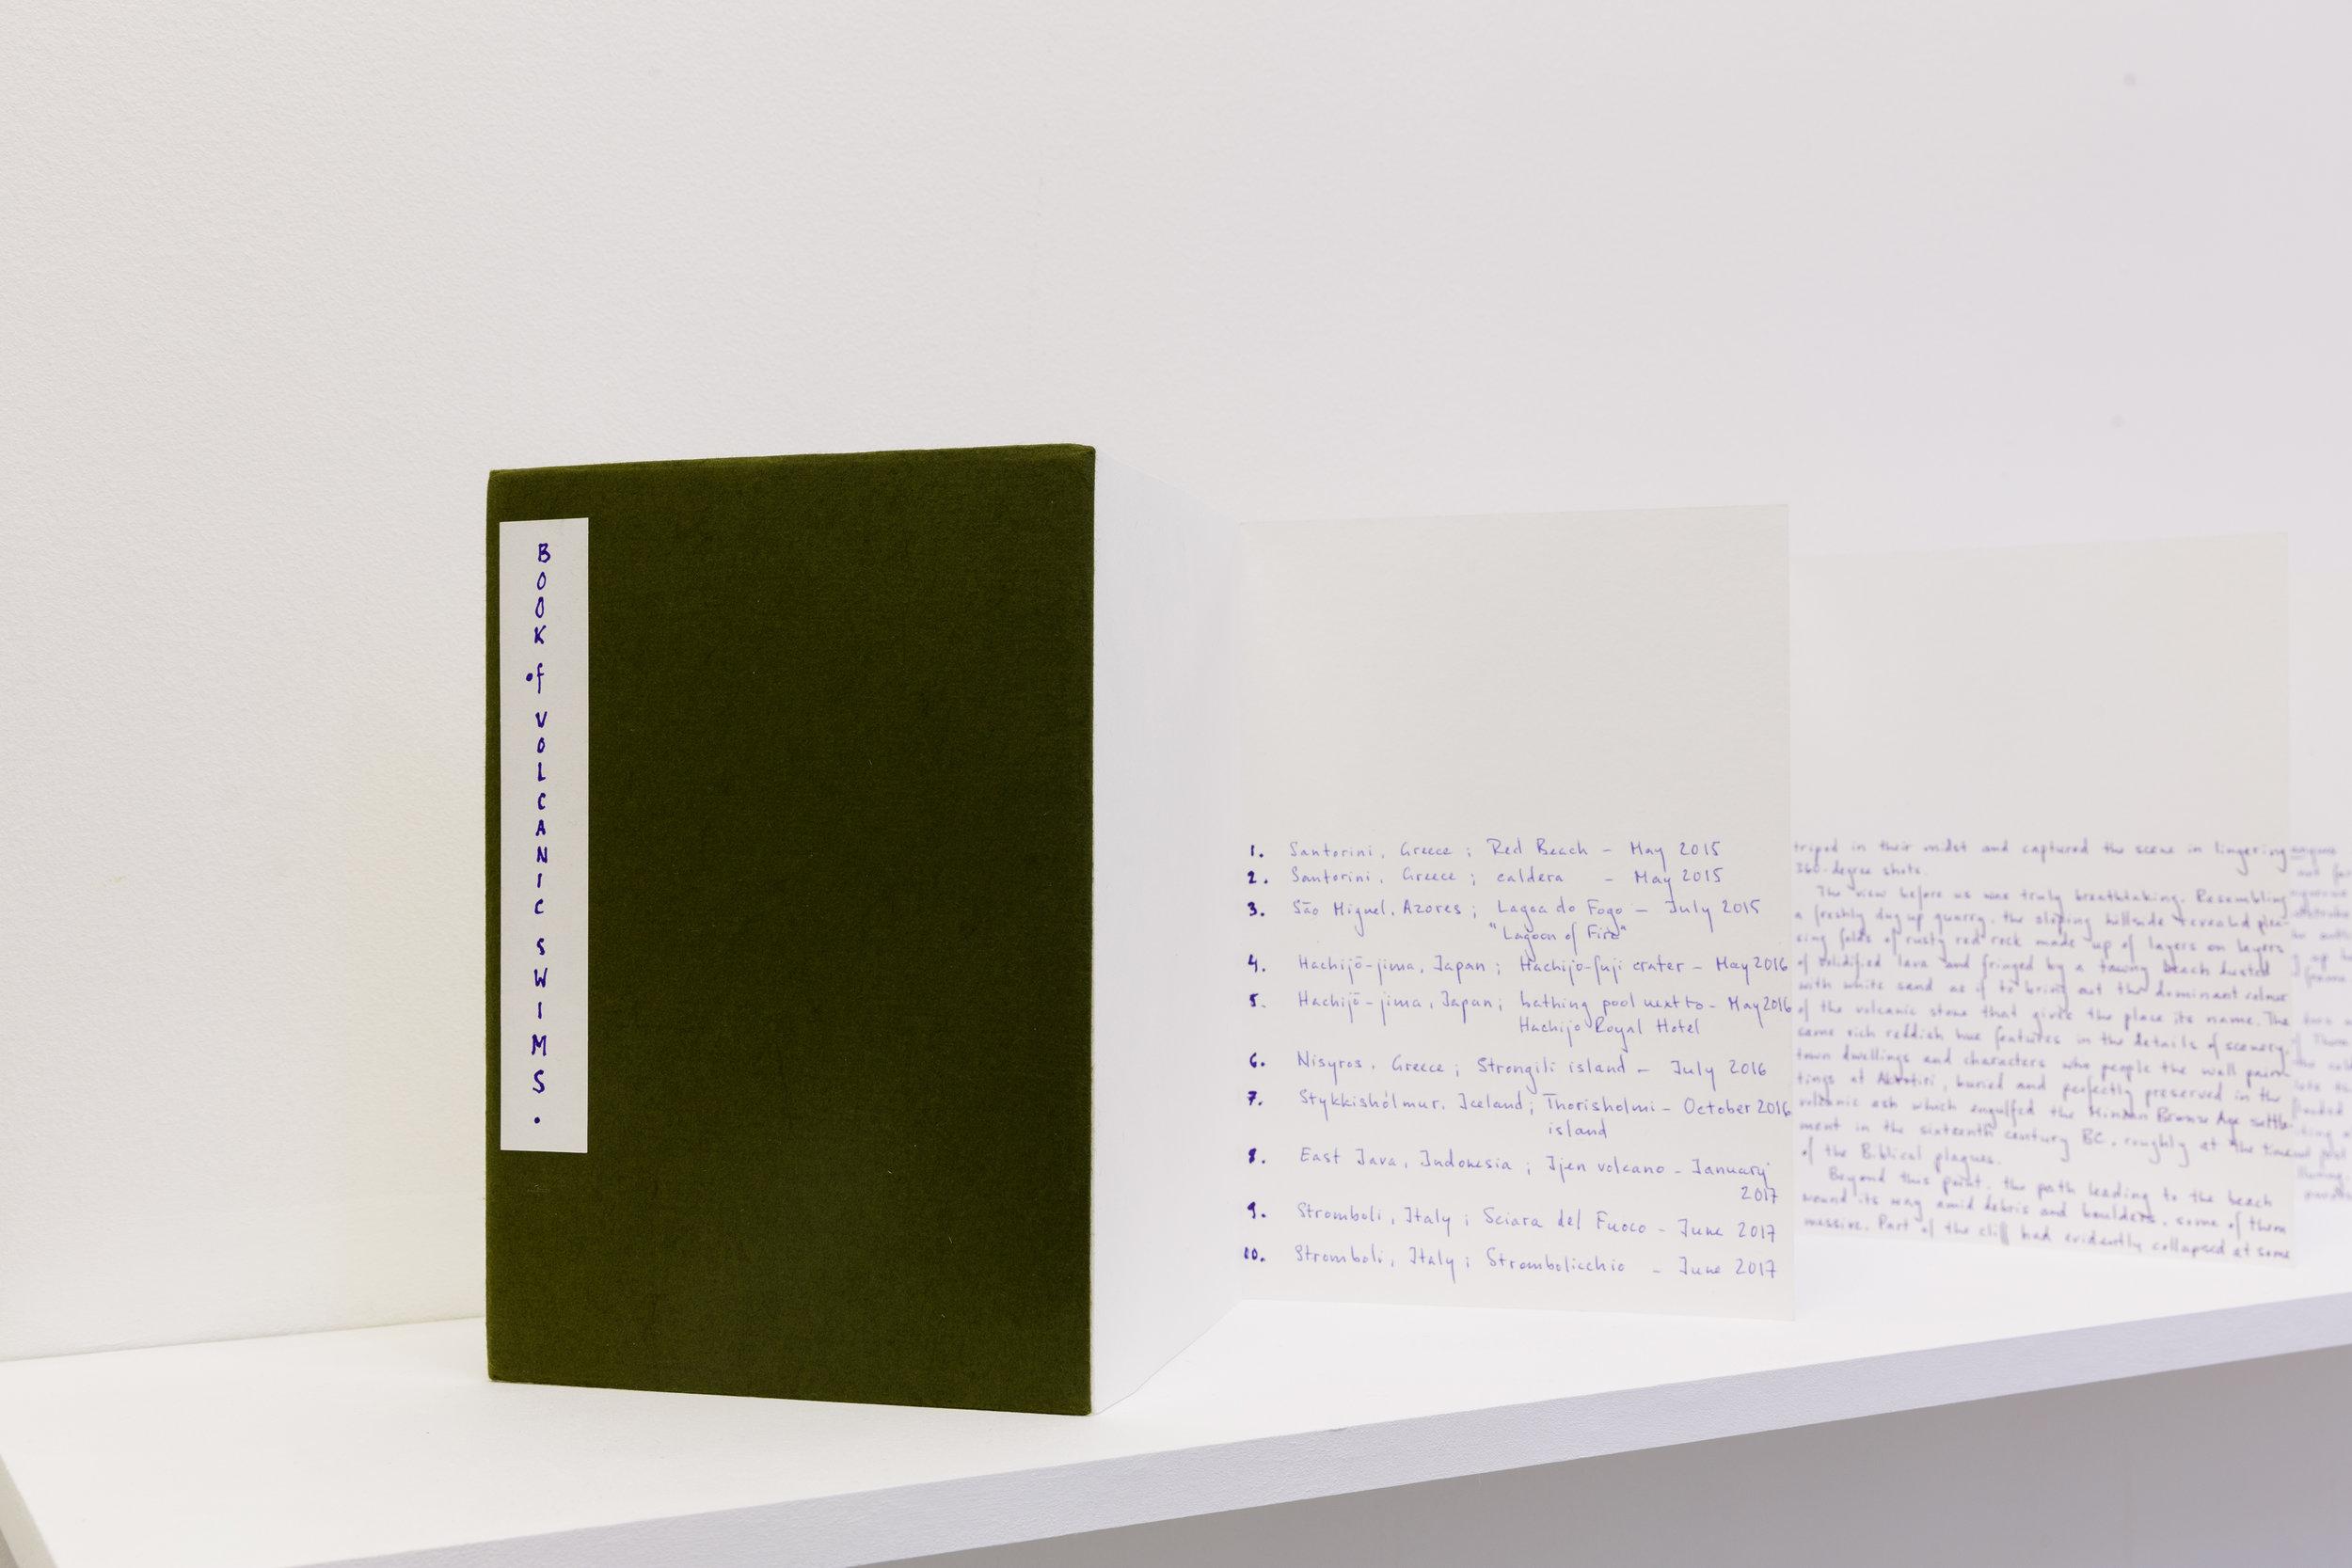 Agnieszka Gratza, Book of Volcanic Swims, 2017. Japanese folded book. Photo: Tim Bowditch.